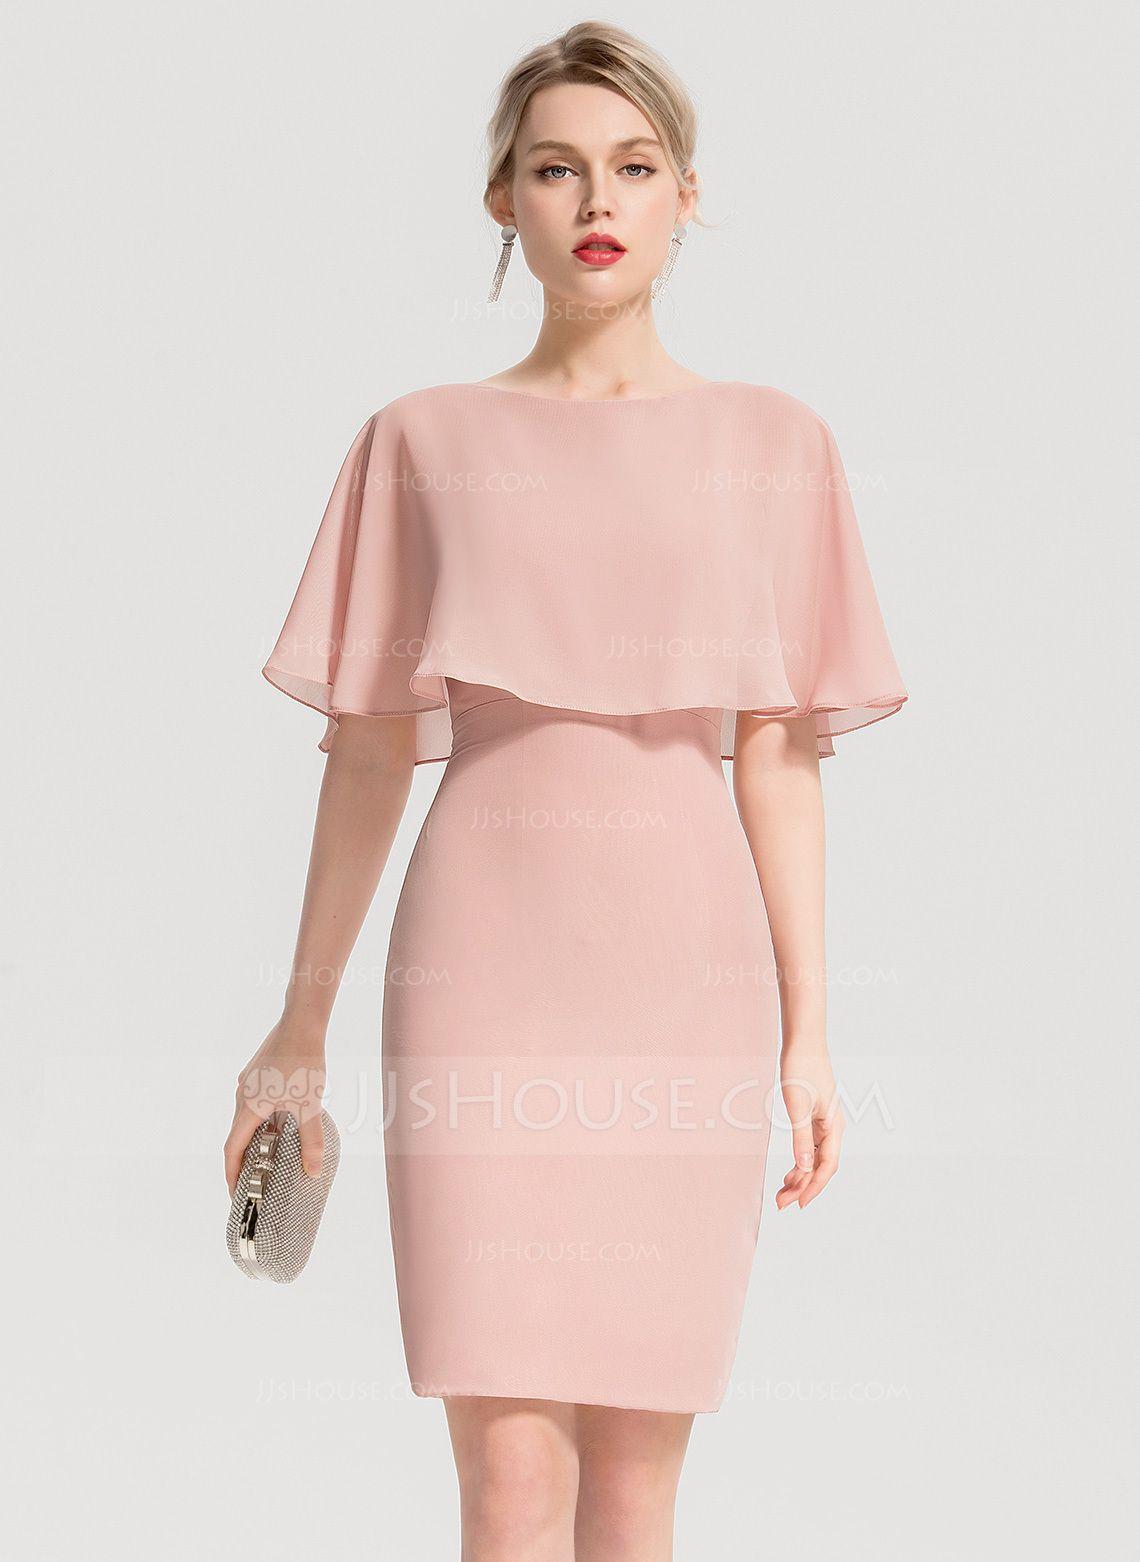 0a215cbbb800 Sheath/Column Scoop Neck Knee-Length Chiffon Cocktail Dress With Cascading  Ruffles (016154231